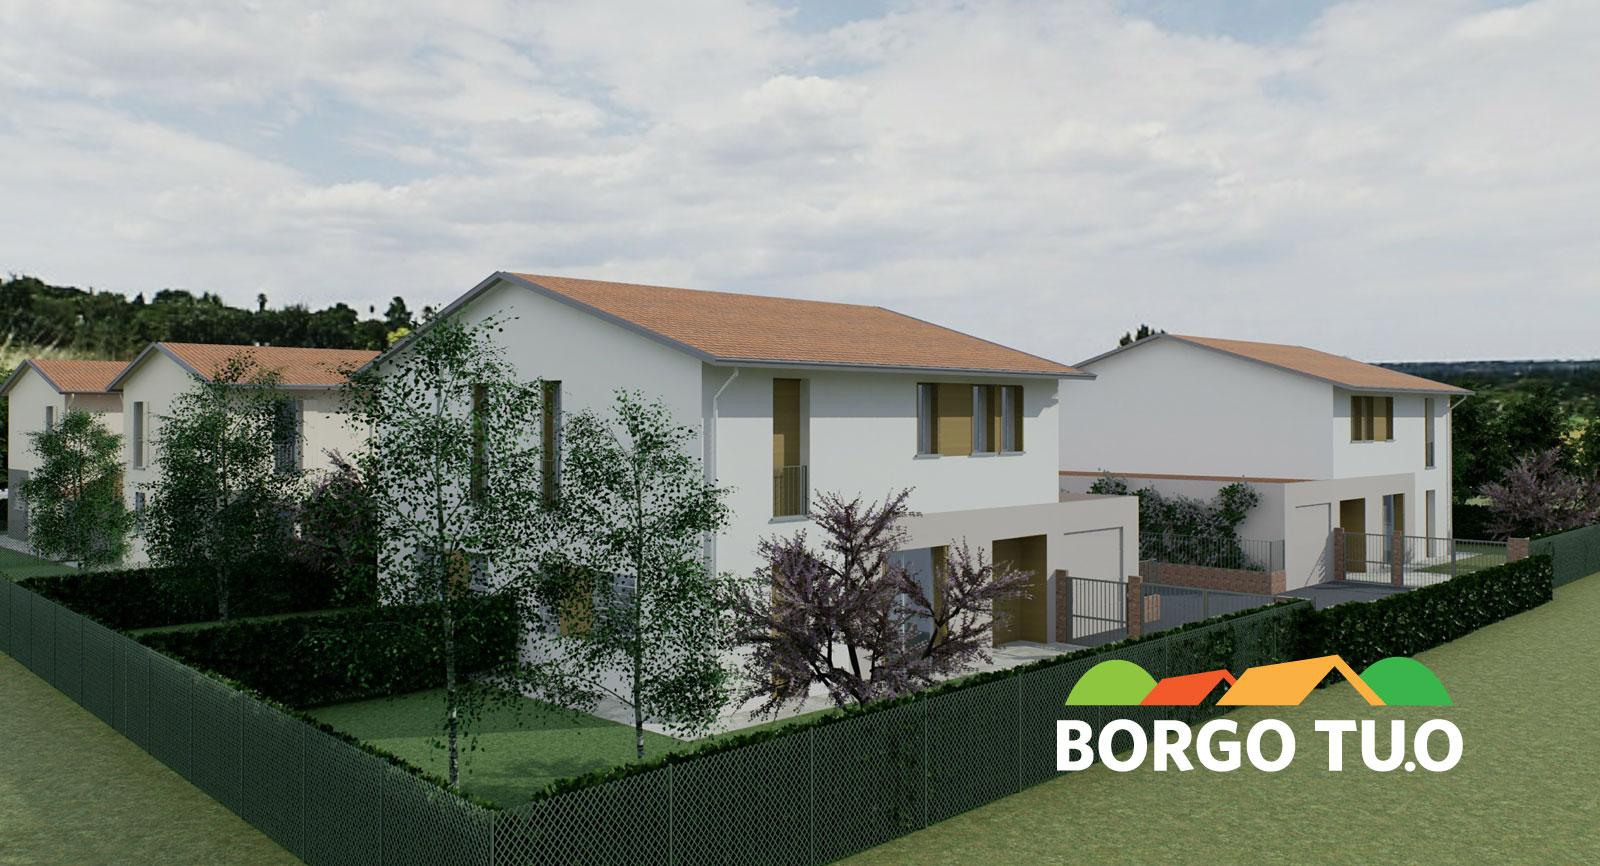 Borgo Tu.o villette bifamiliari